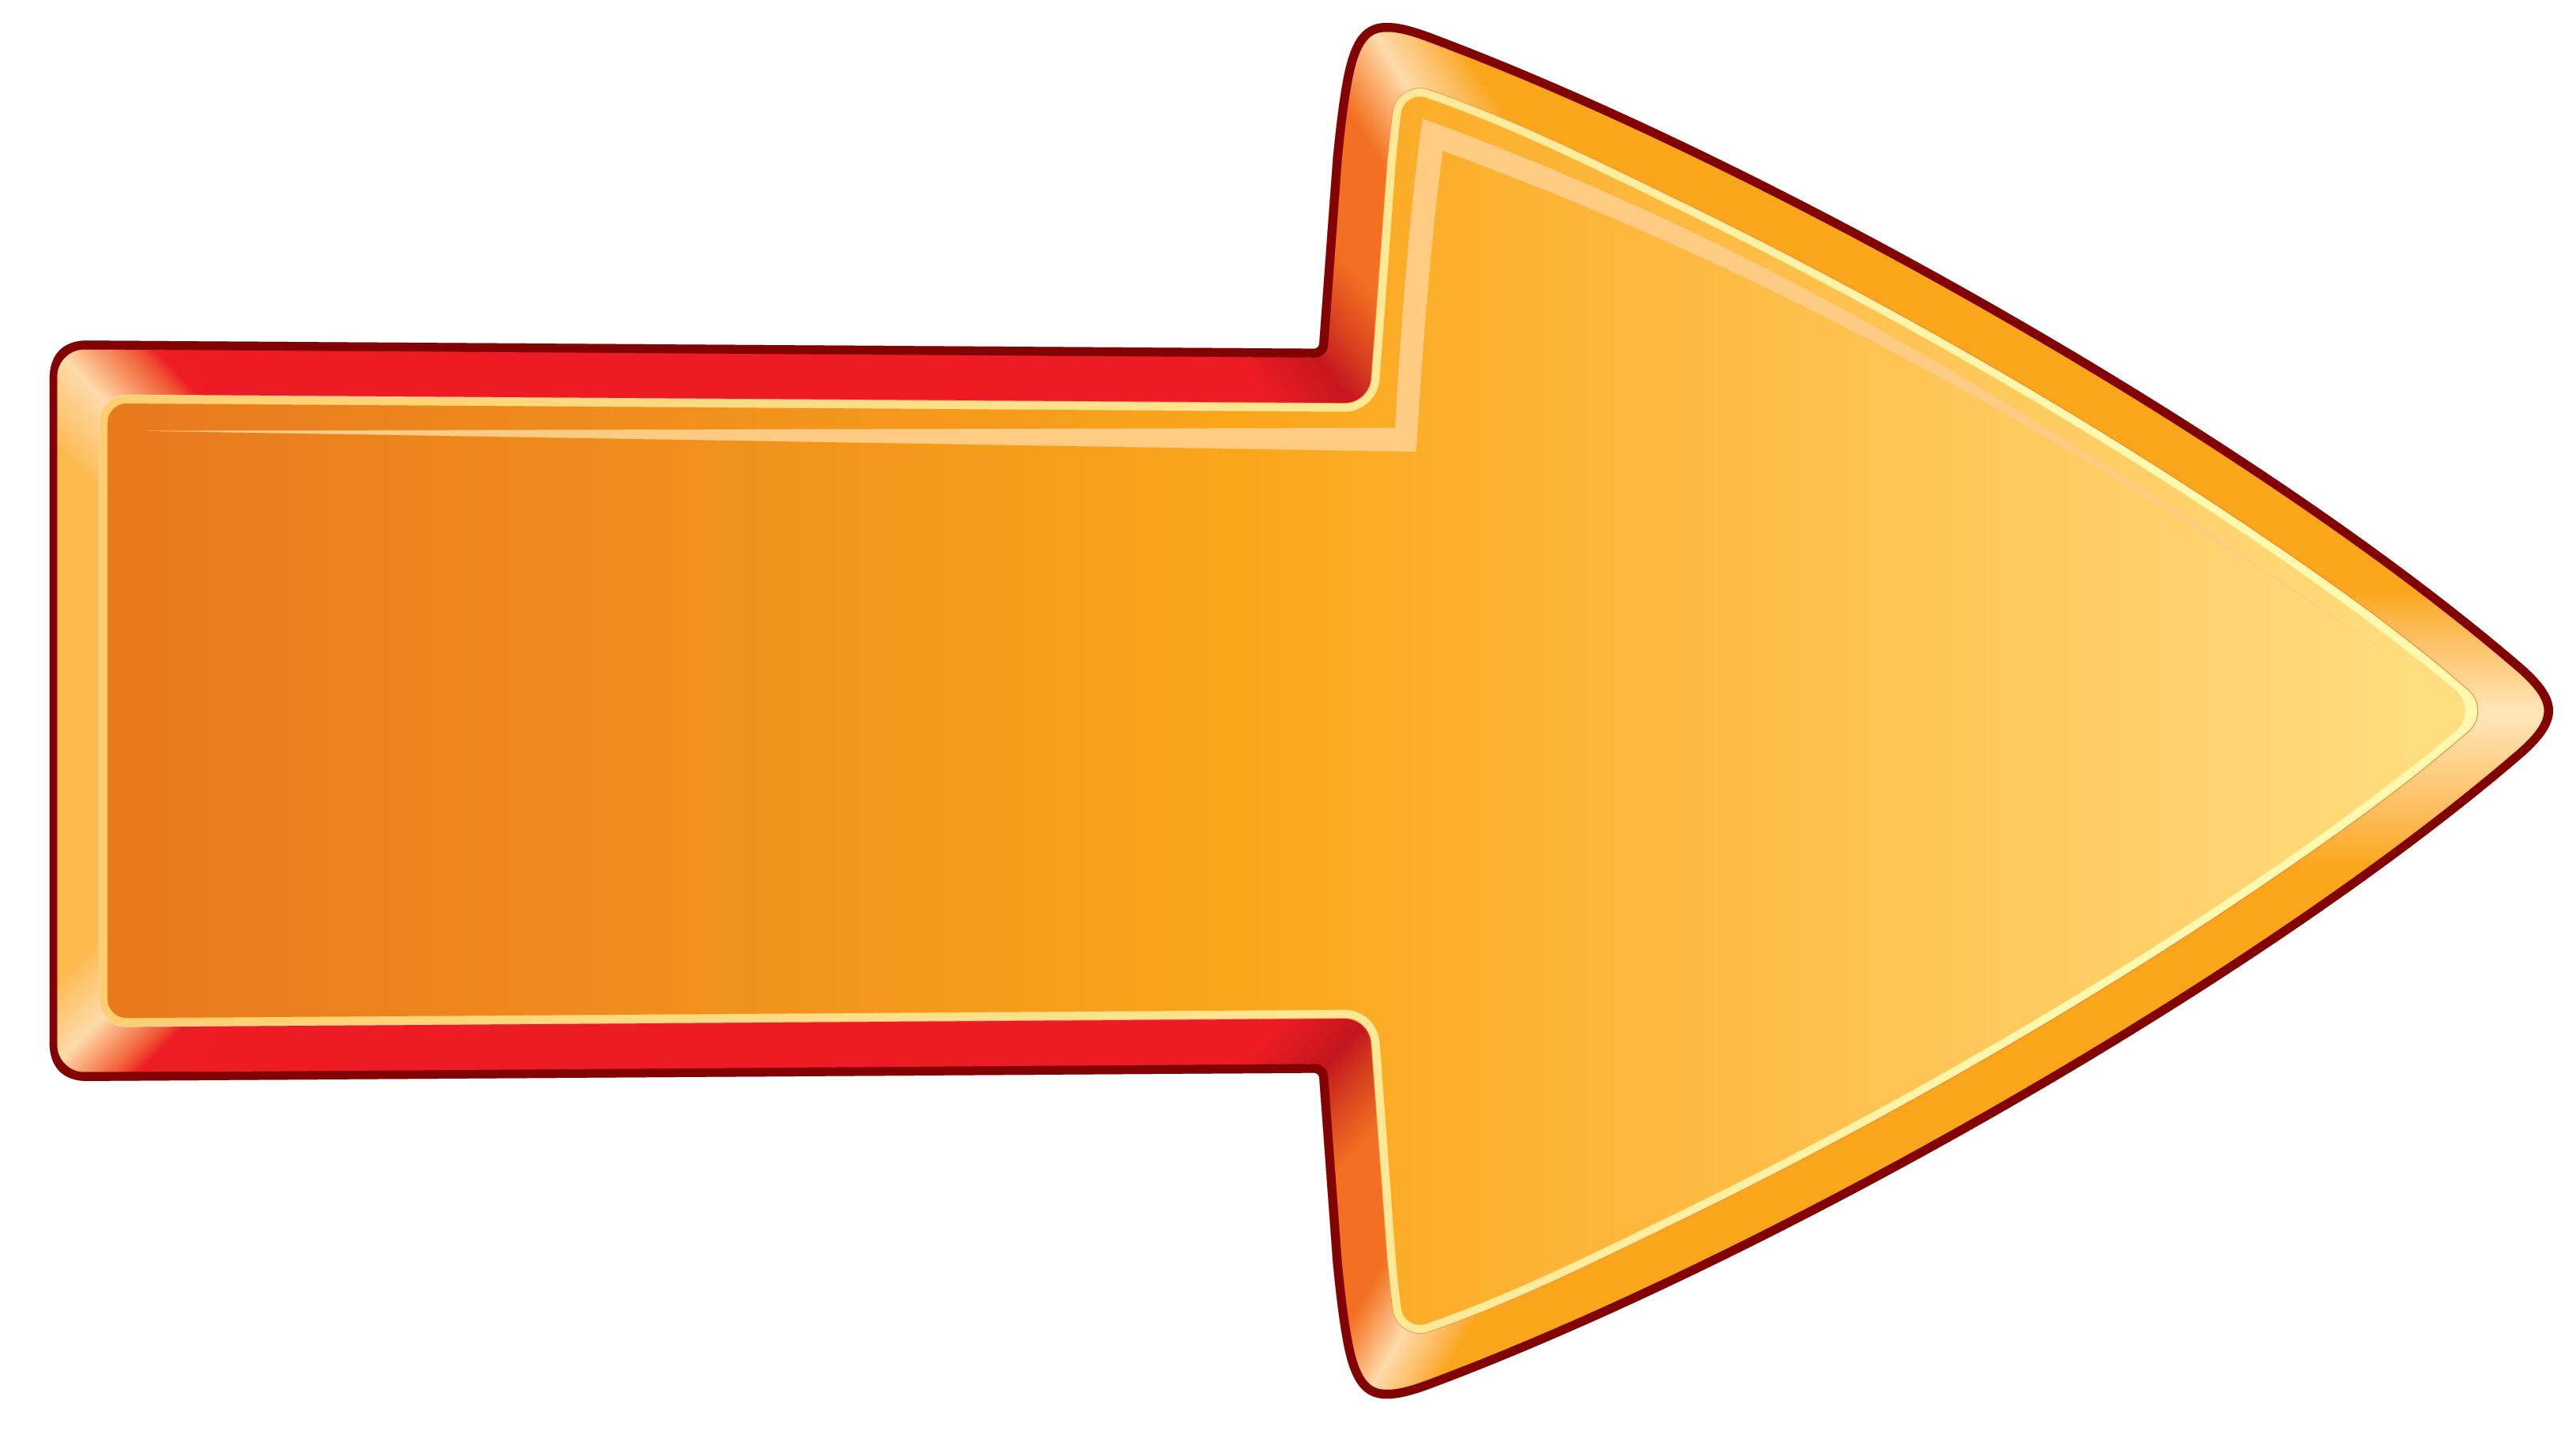 Block arrow clipart transparent vector library download Arrow Designs Clipart - Clipart Kid vector library download